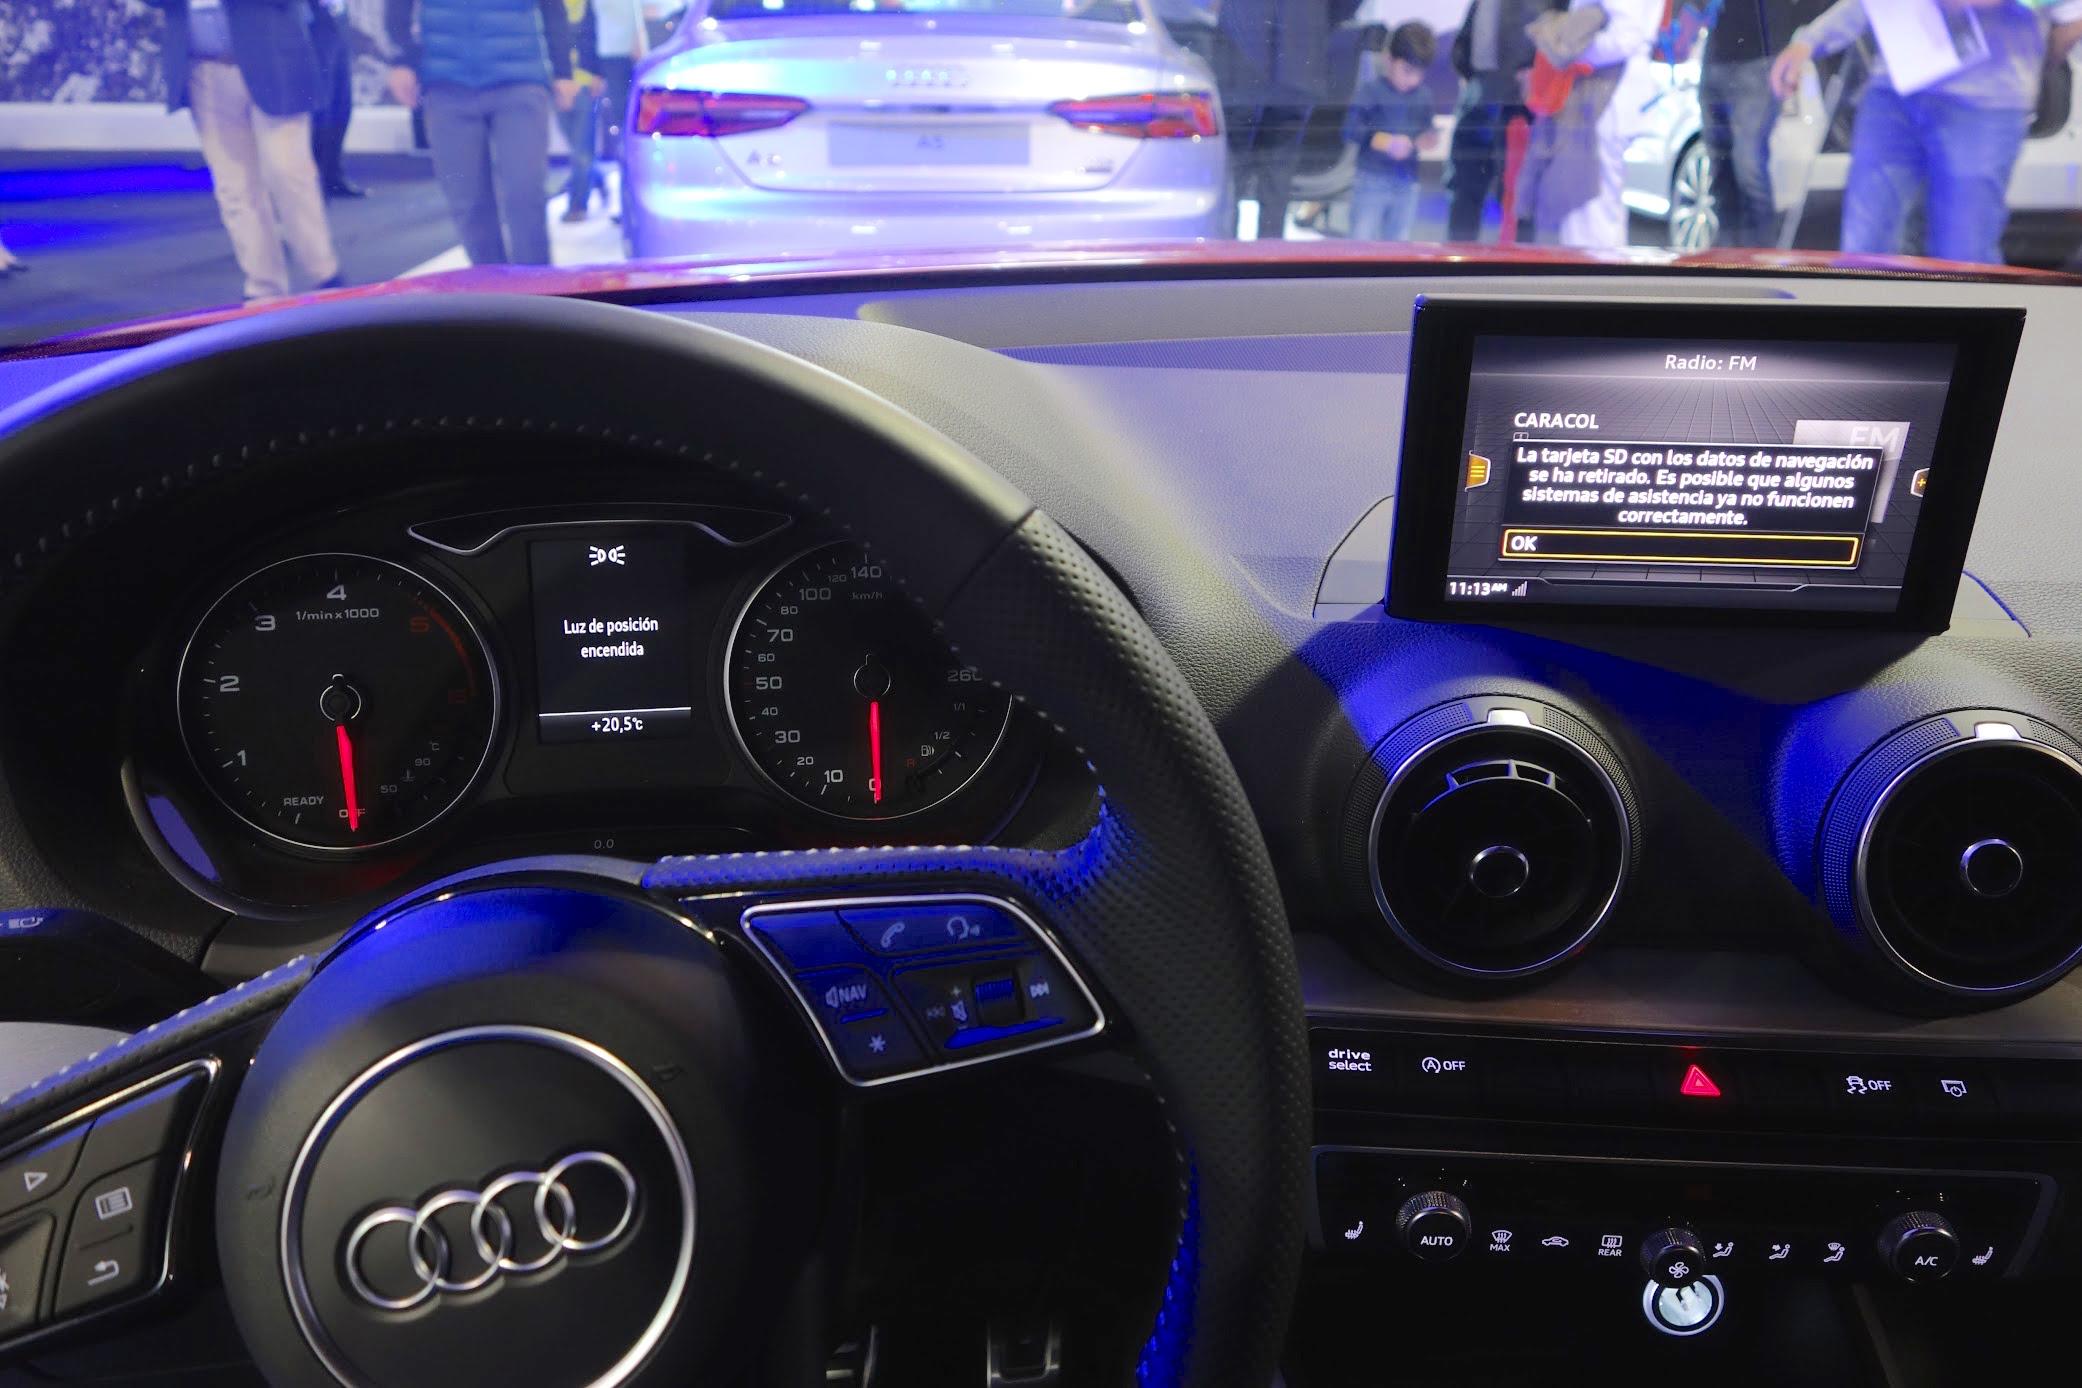 Audi Q2 MMI display at Bogota Auto Show 2016